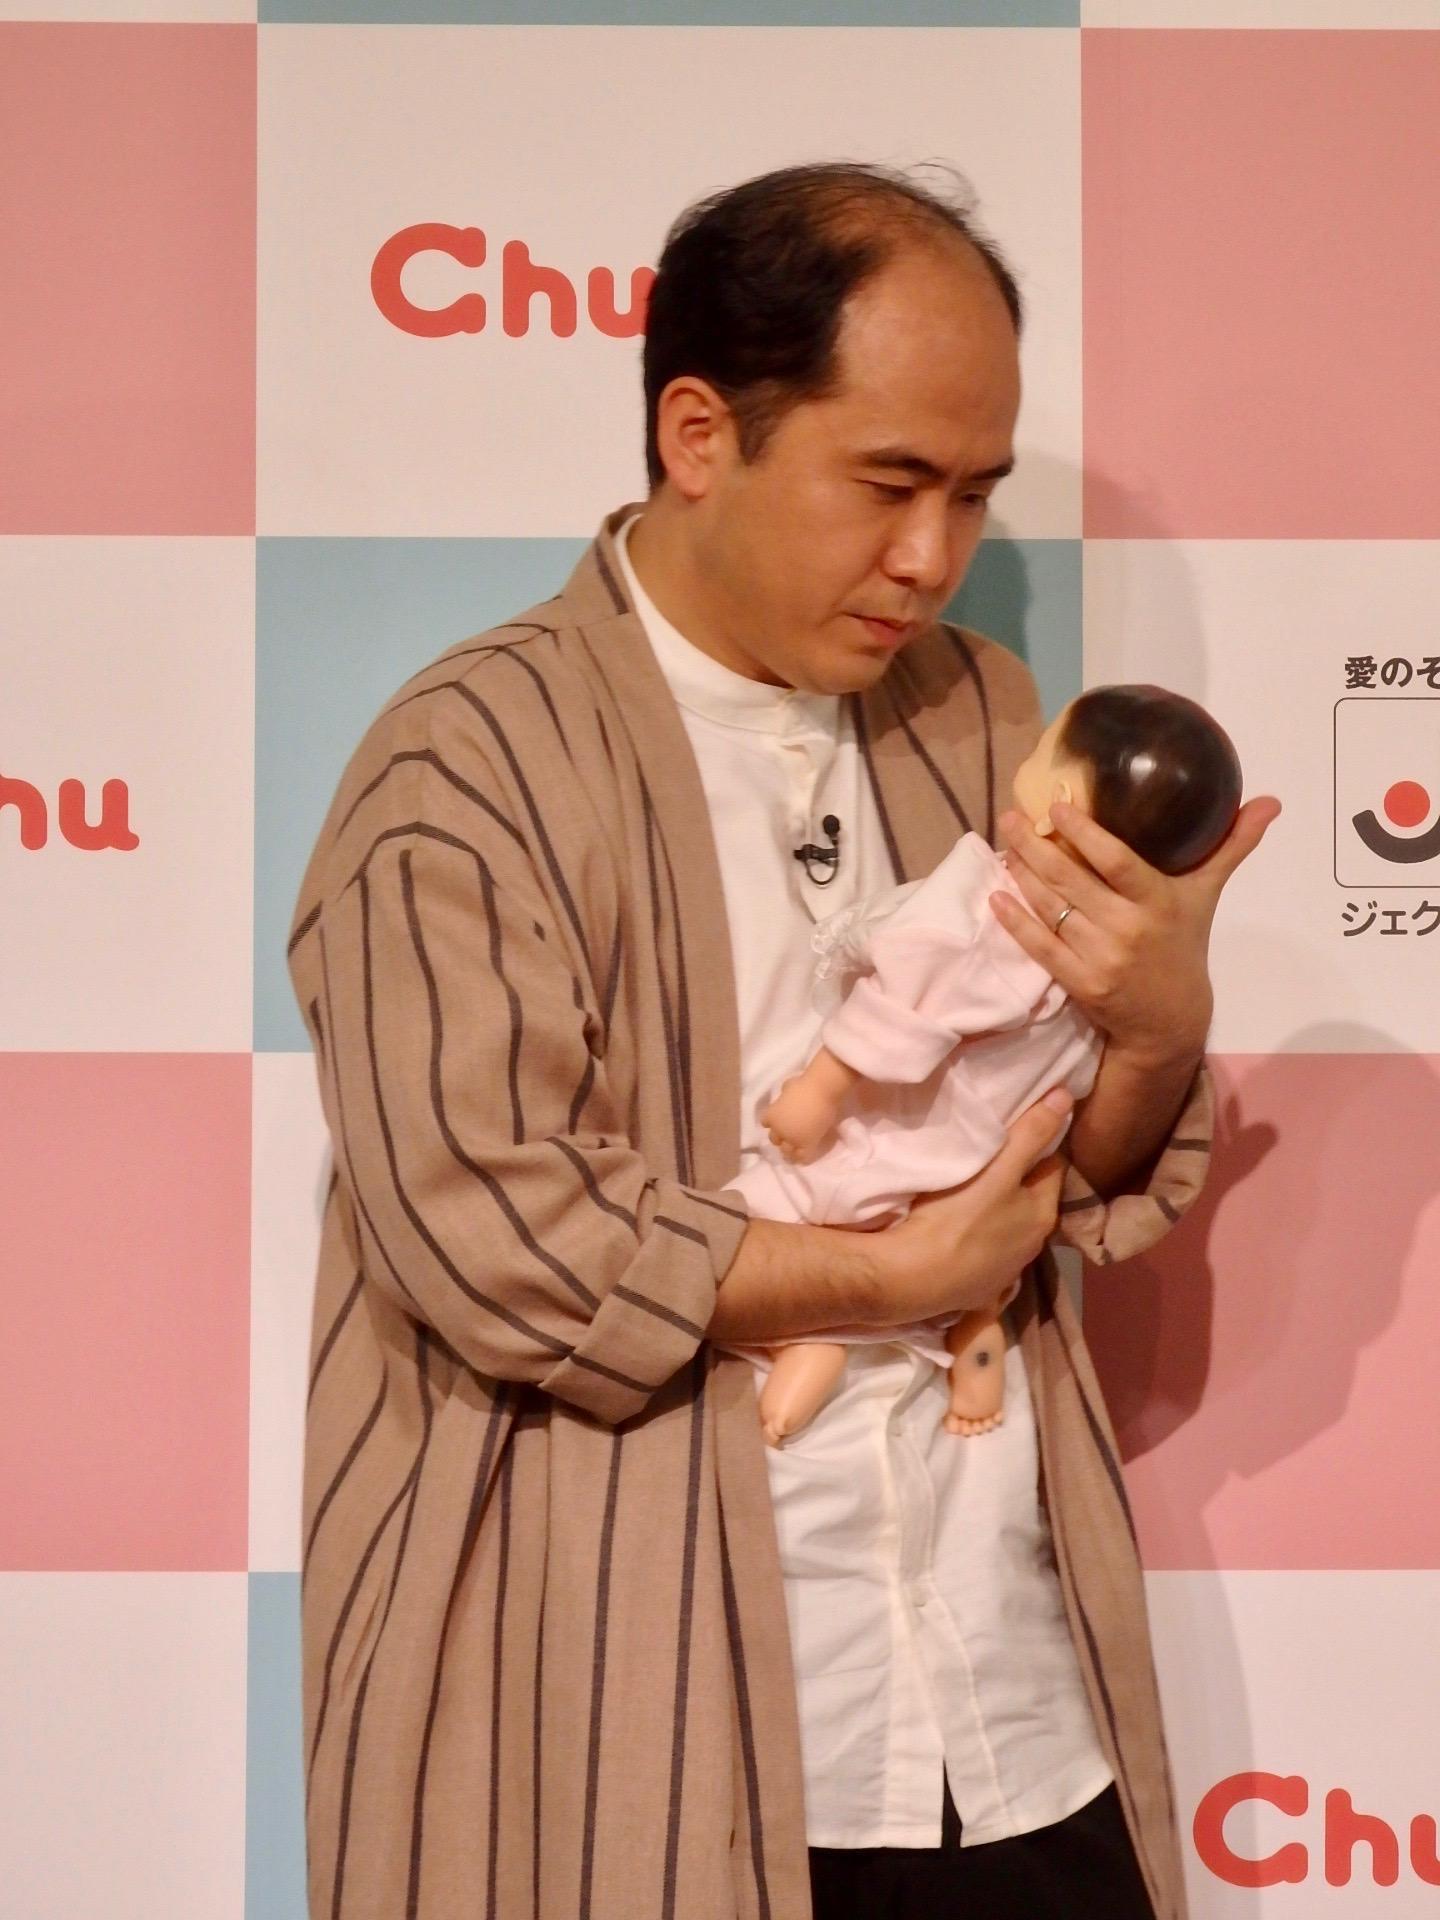 http://news.yoshimoto.co.jp/20180929174126-c7094812812e5b32dcbbdd492f7f0793a1658f71.jpg